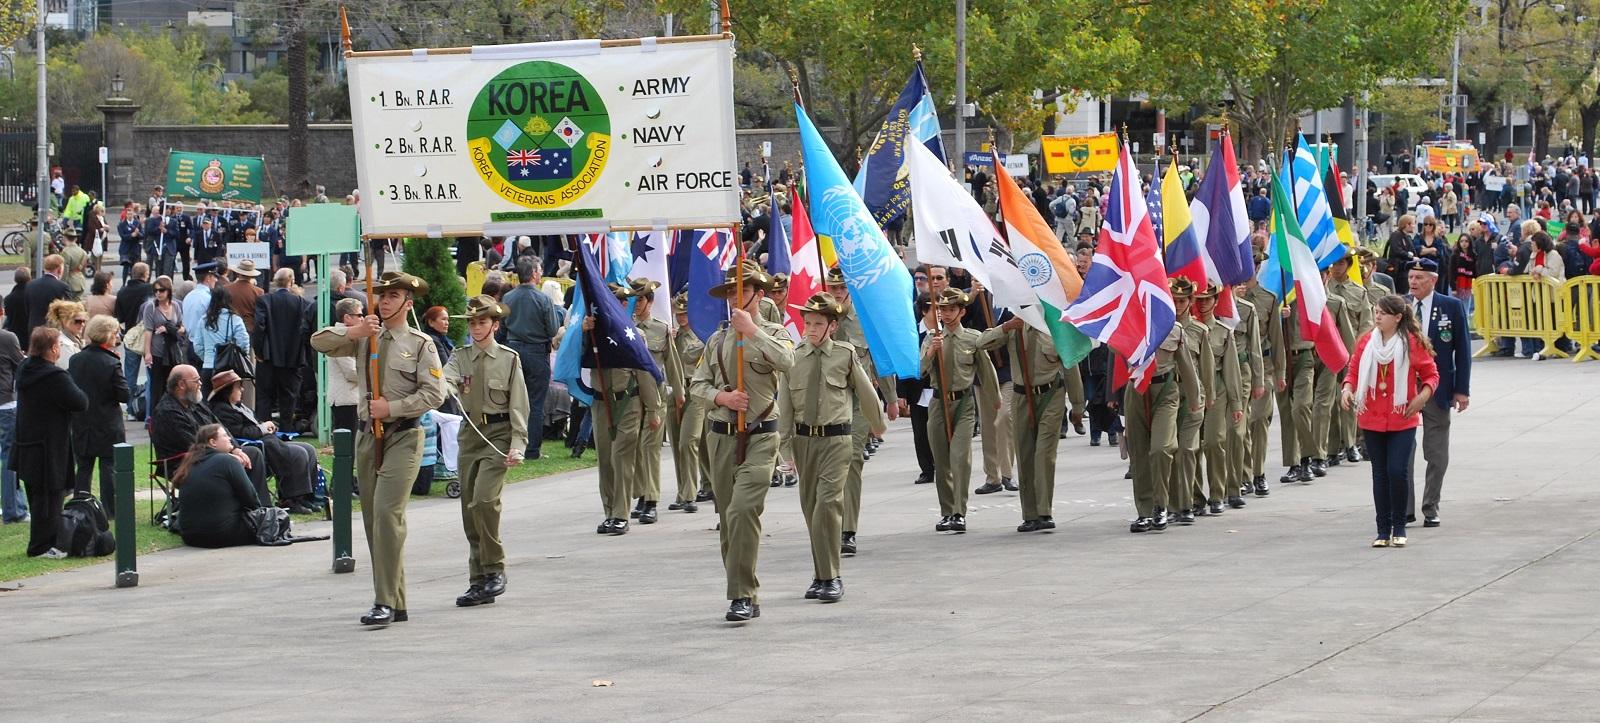 Korean War ex-servicemen at the 2009 Anzac Day march in Melbourne (Photo:  Mattinbgn/Wikimedia Commons)